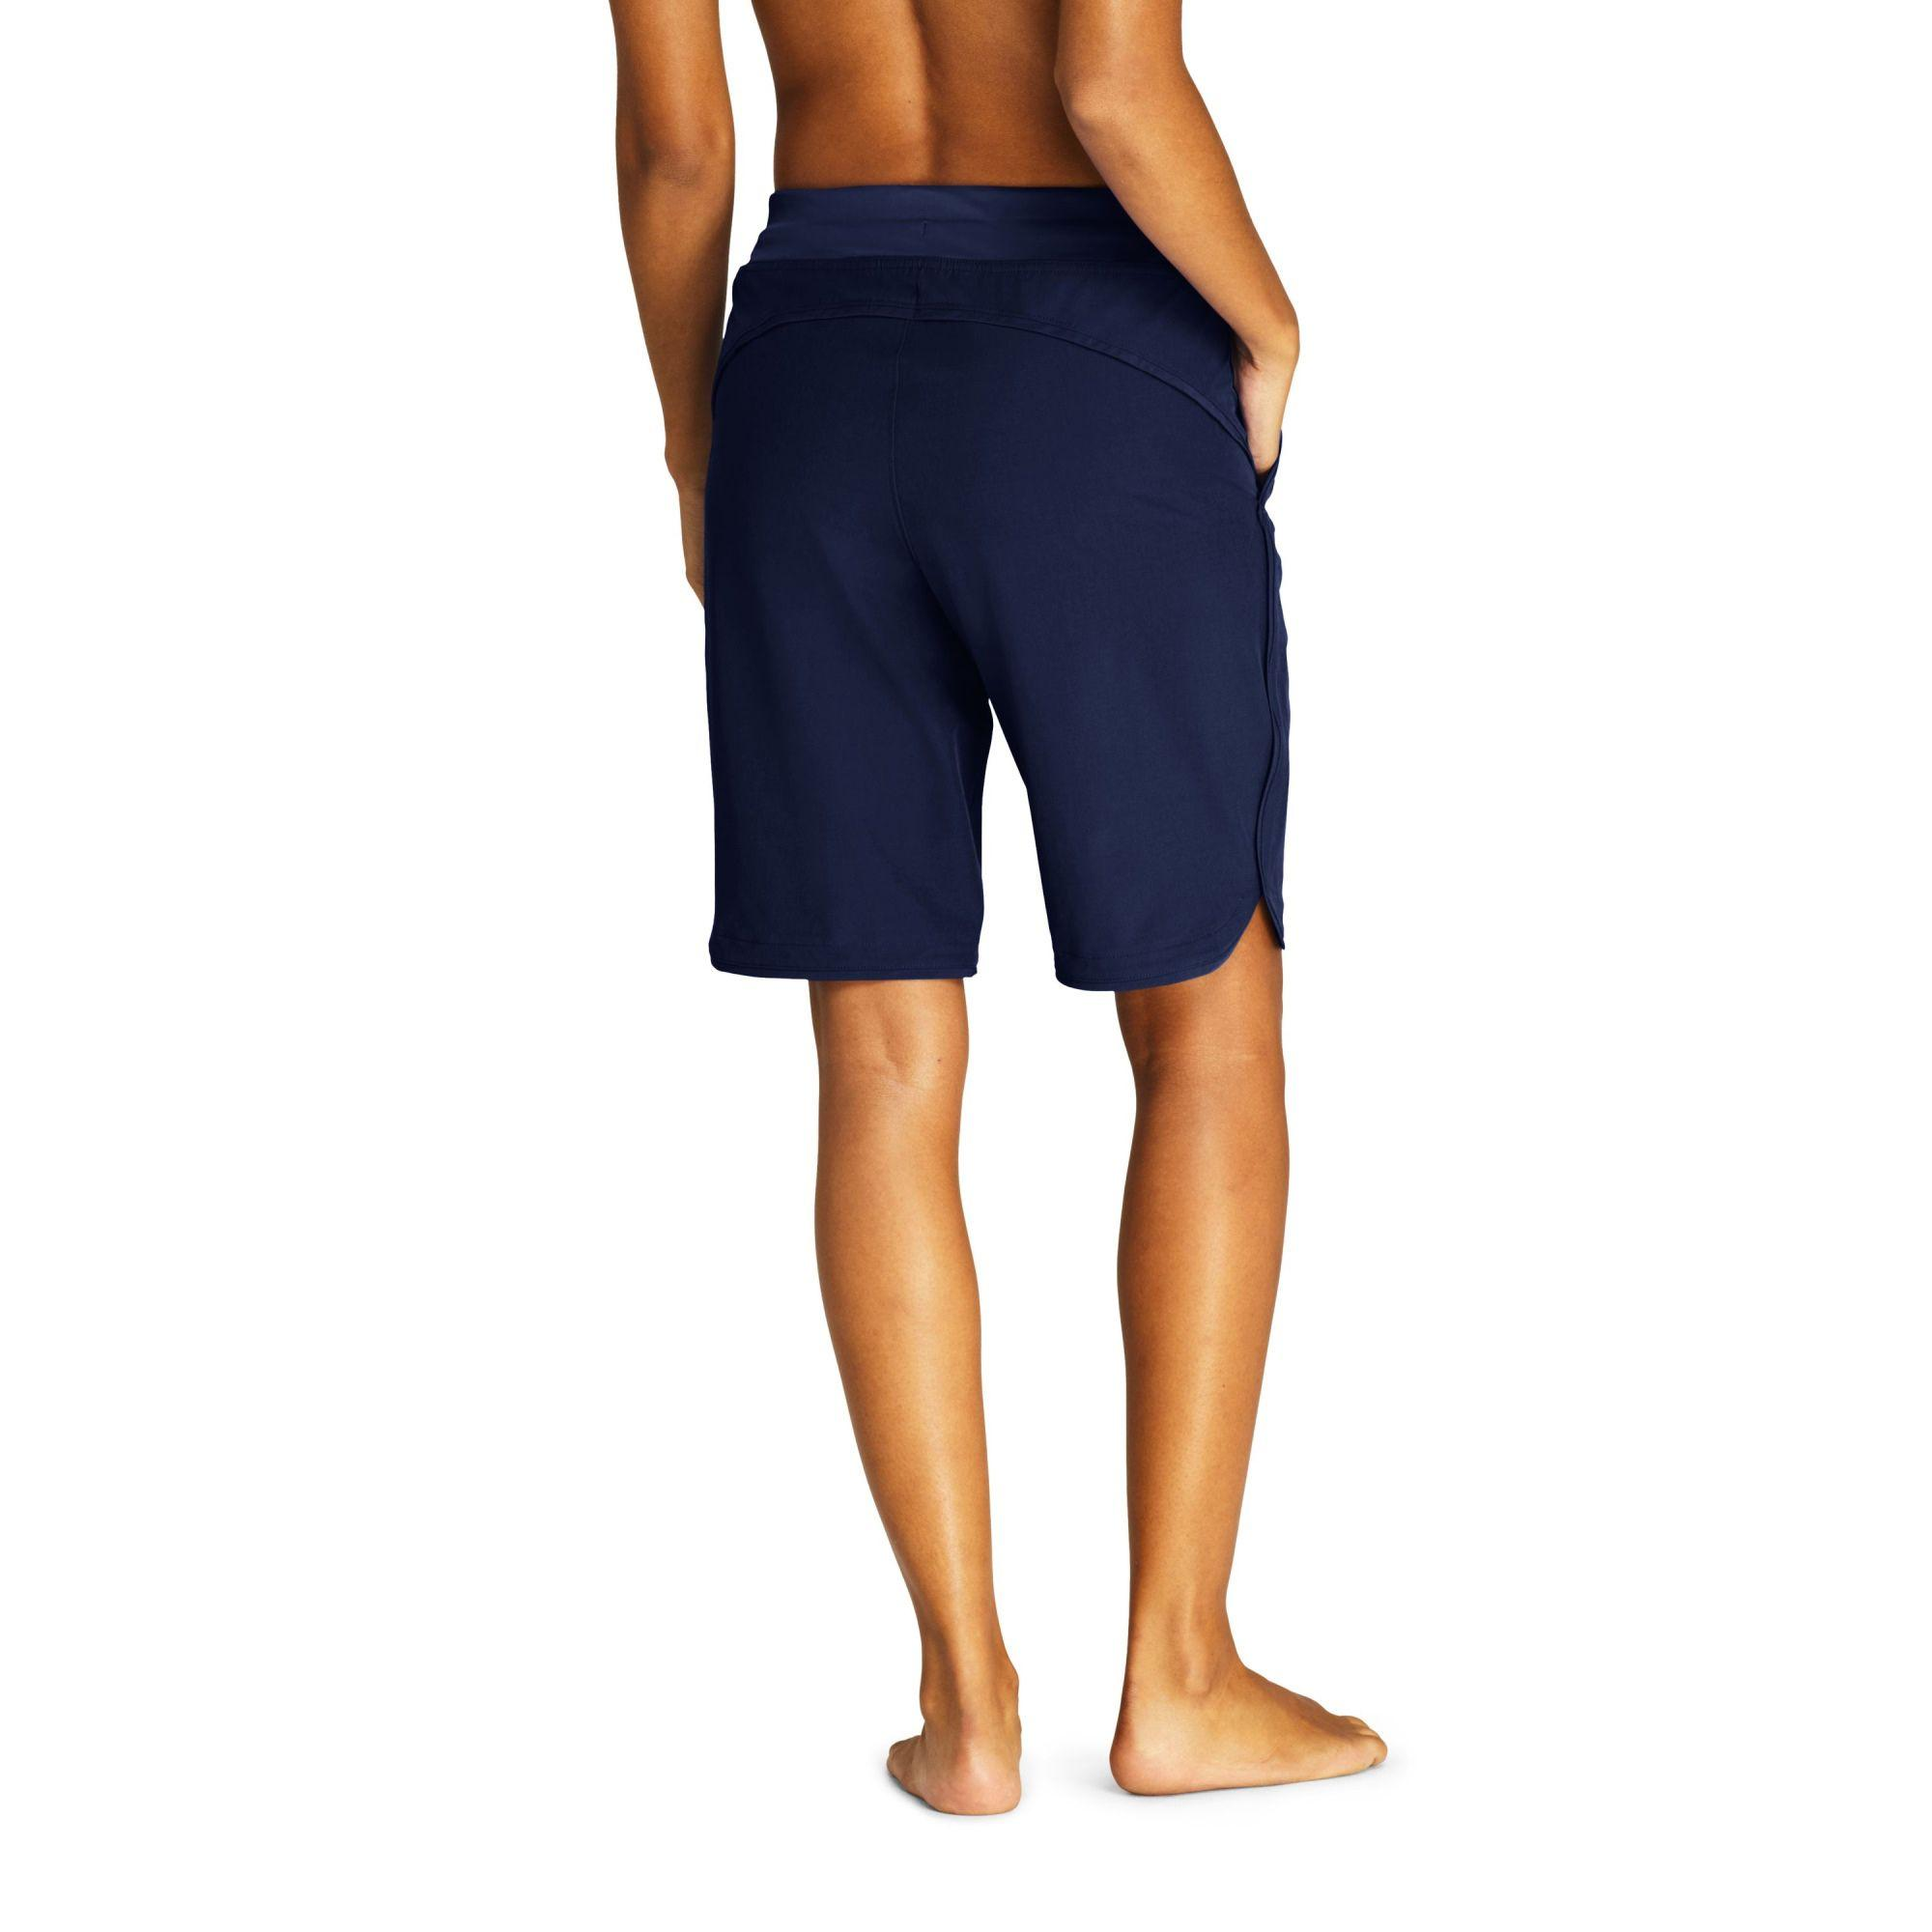 5ee52fb5e6 ... Lands' End - Blue Aqua Sport Comfort Waist 9'' Swim Shorts - Lyst.  Visit Debenhams. Tap to visit site